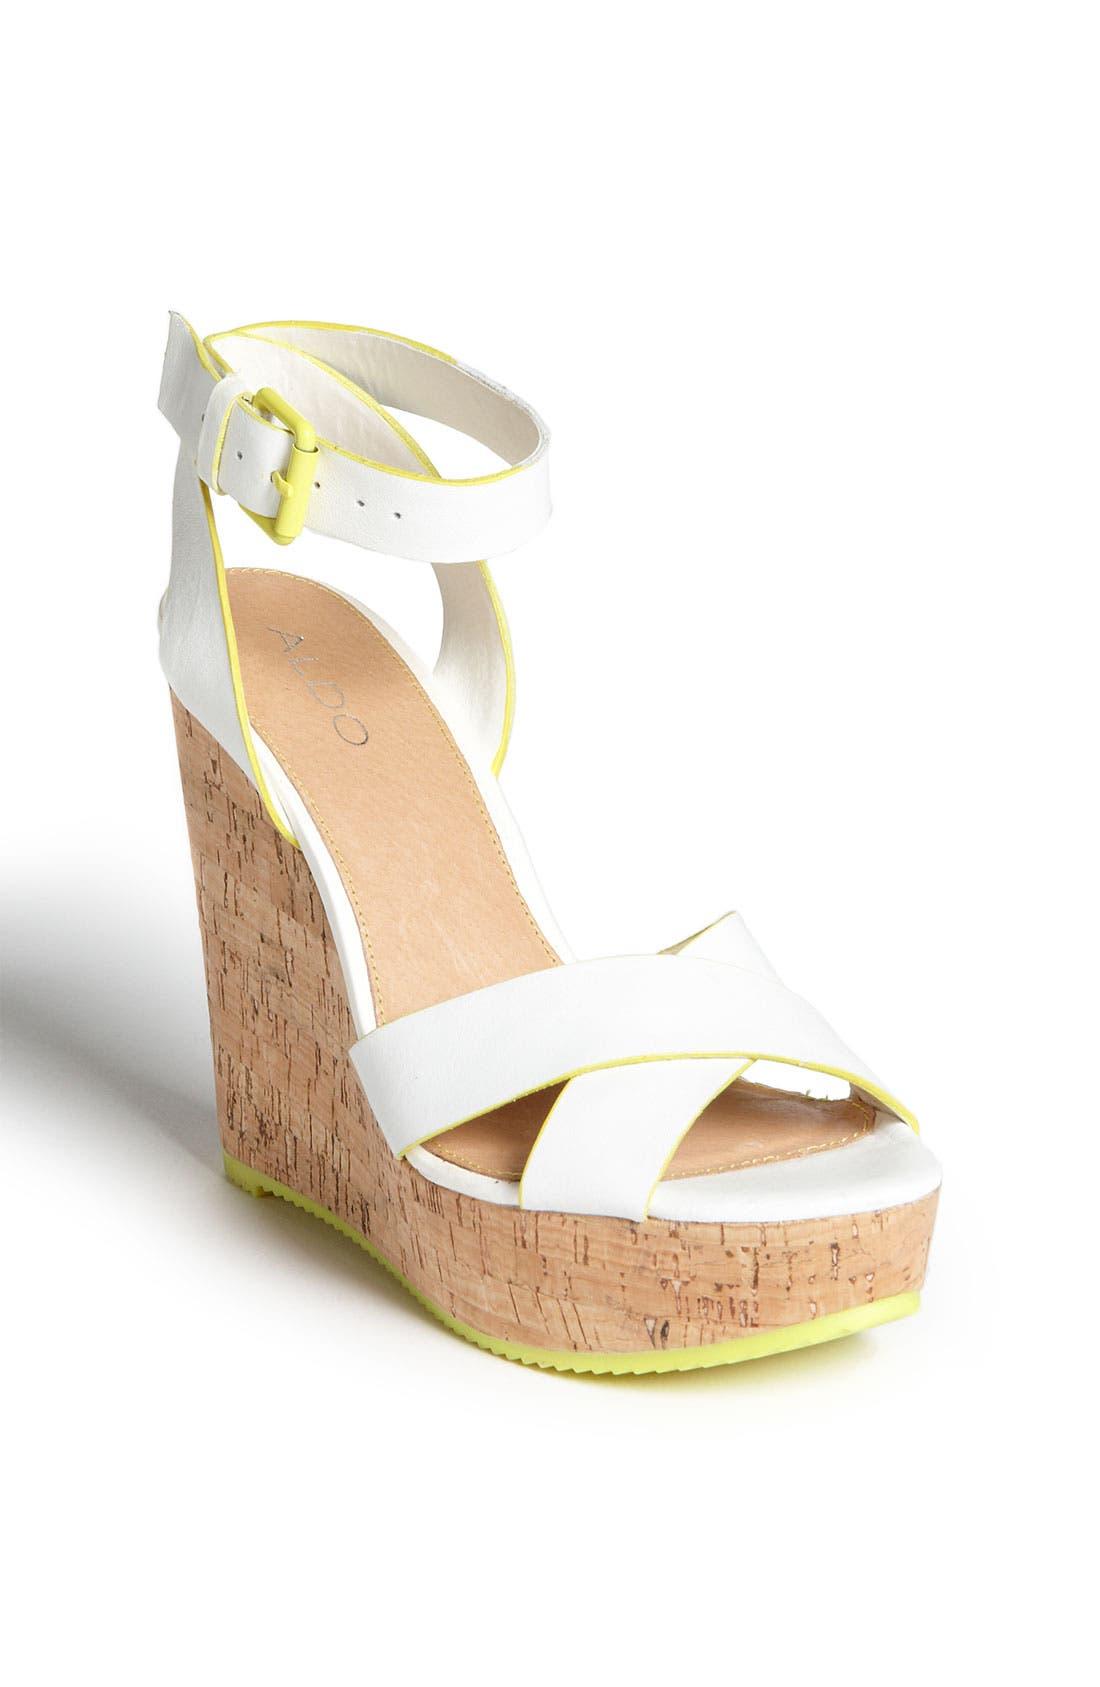 Main Image - ALDO 'Brimfield' Wedge Sandal